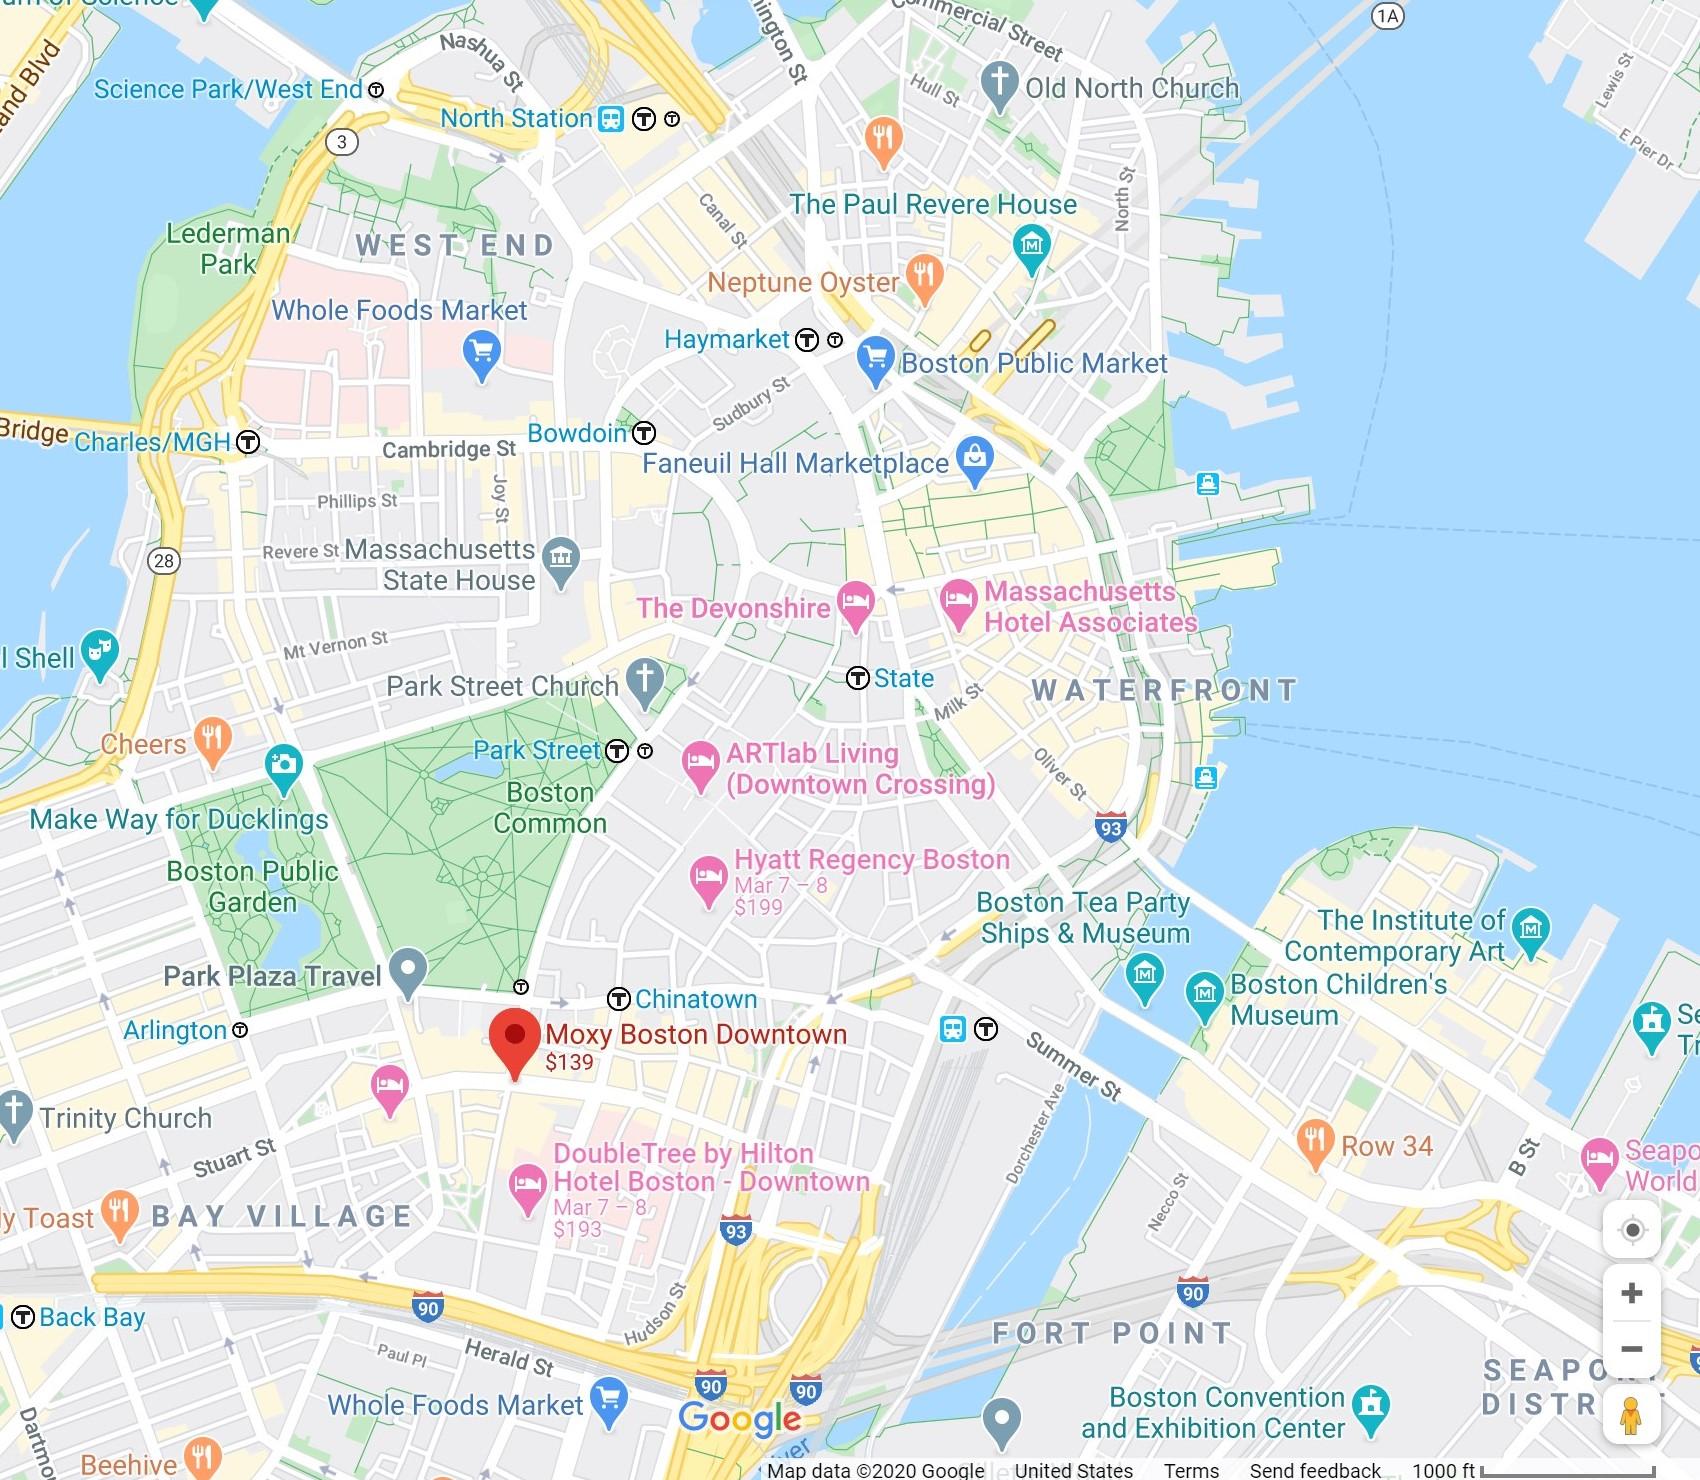 Moxy Bostown Downtown Google Maps Screenshot